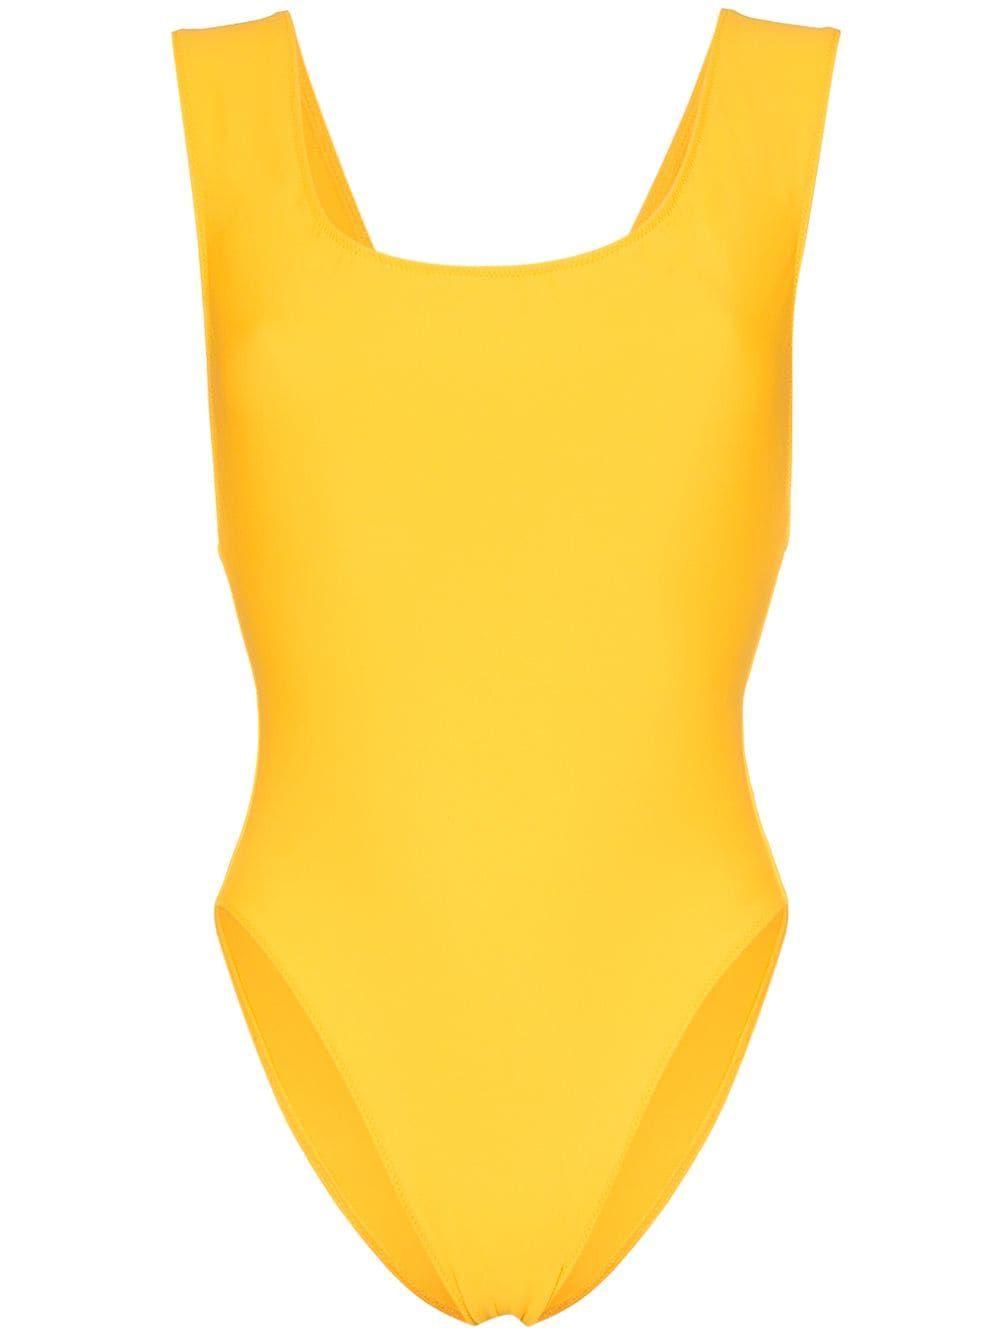 b1bb522280995b Araks Jireh scoop neck cutout swimsuit - Yellow, 2019 | Products ...